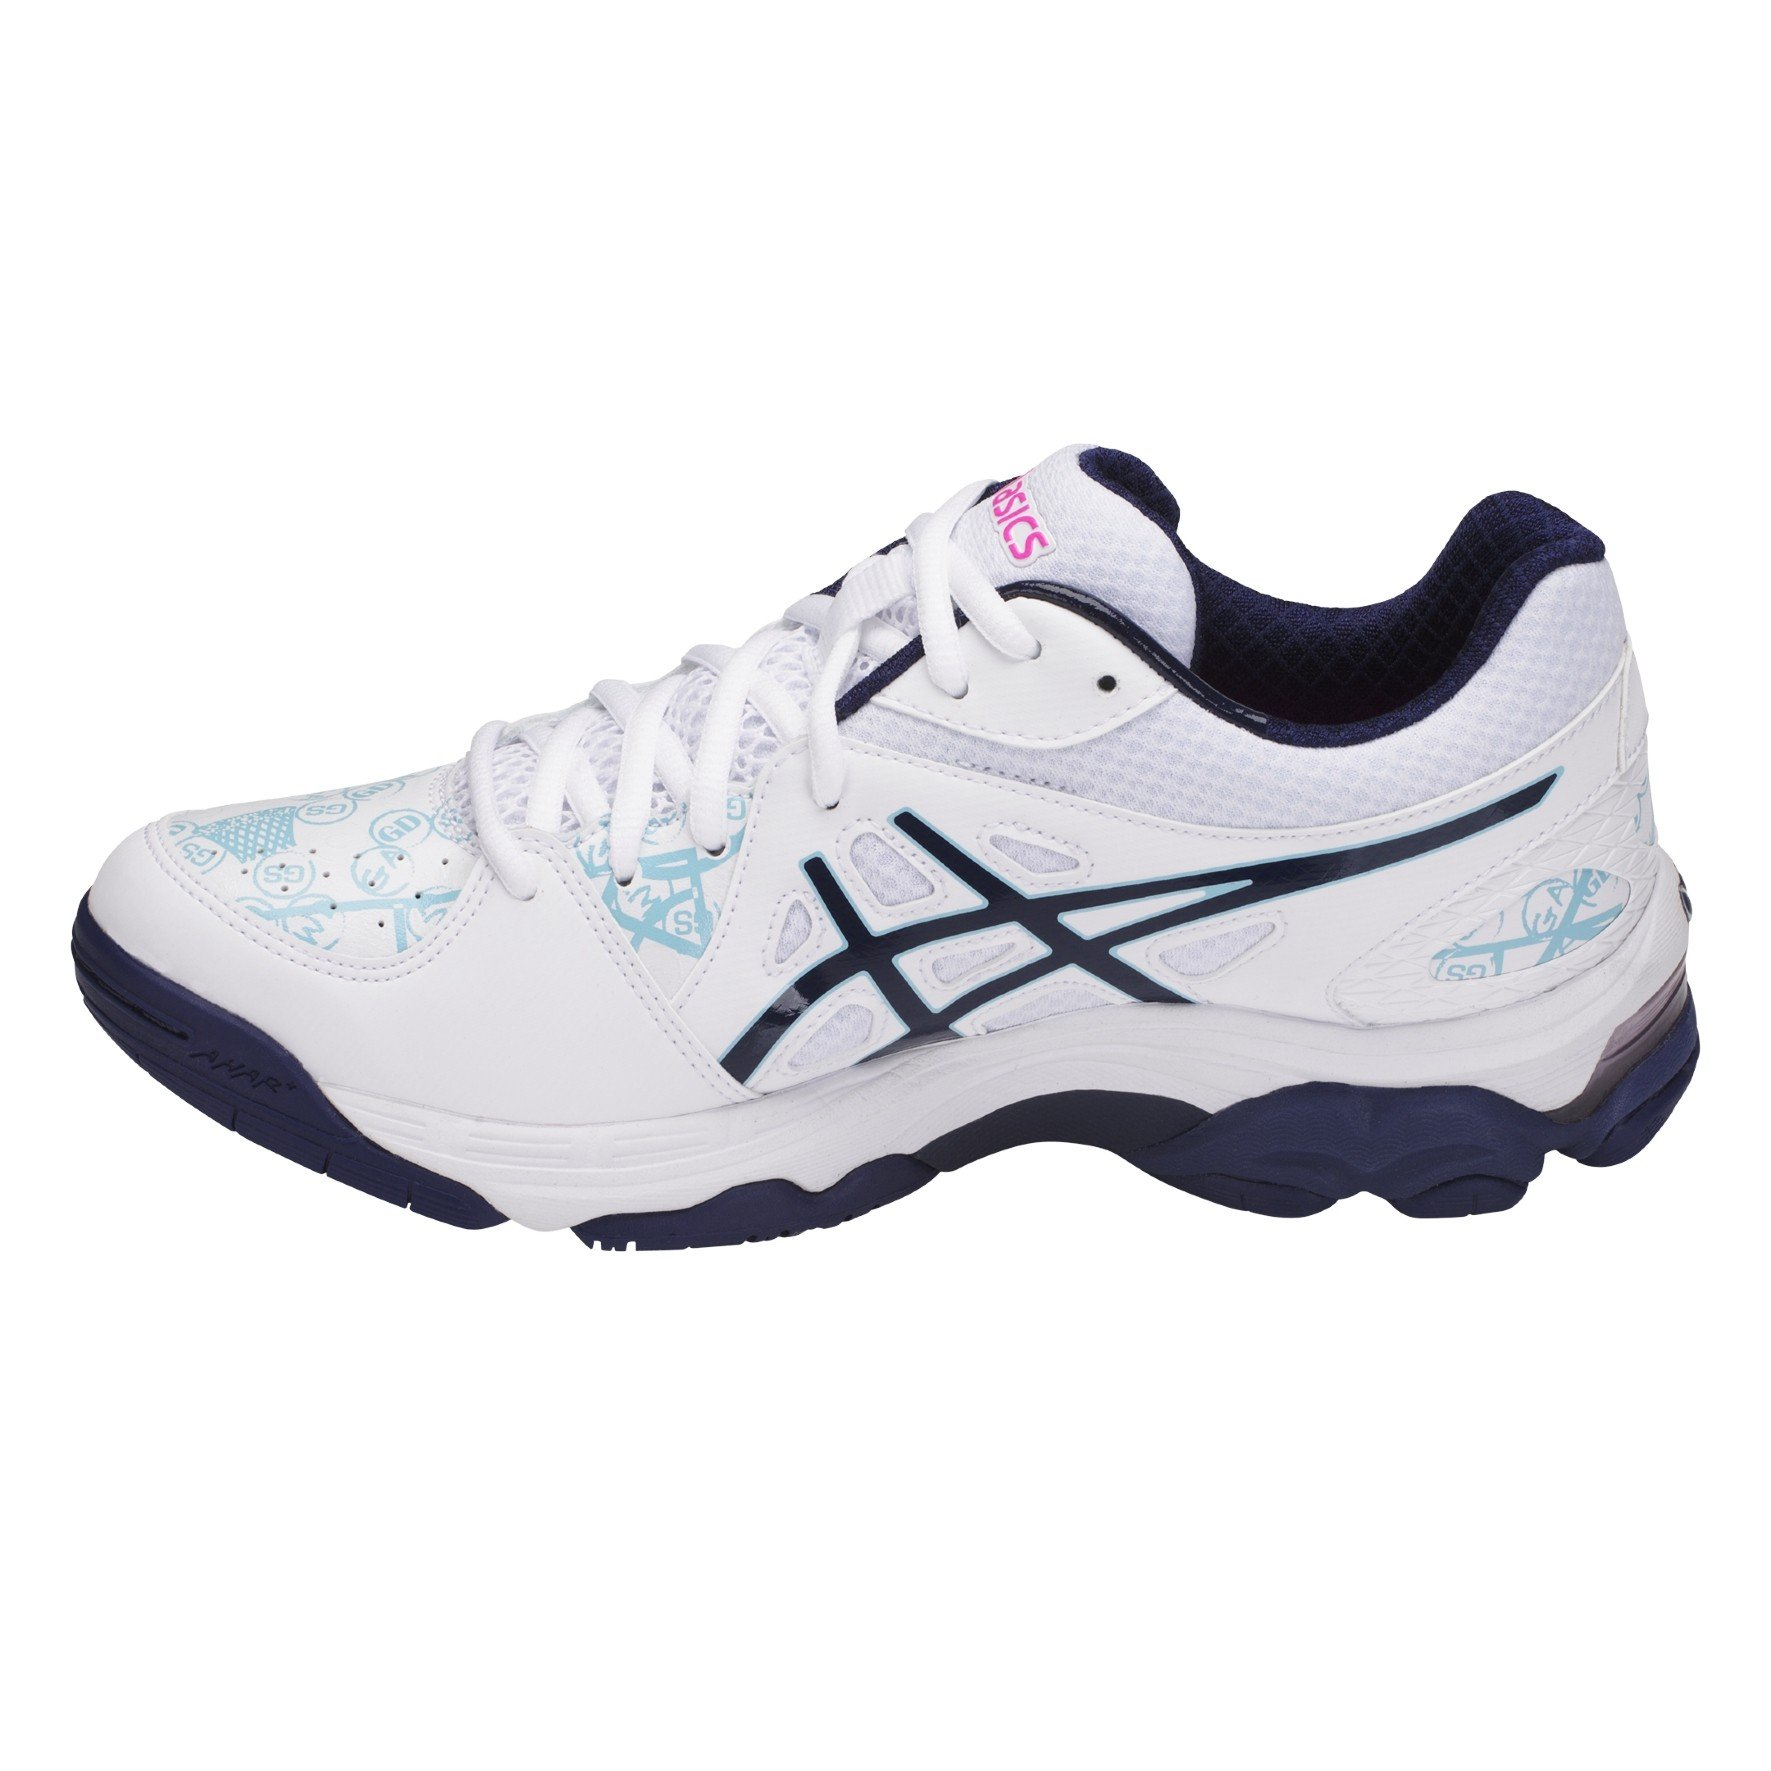 asics netball trainers size 6